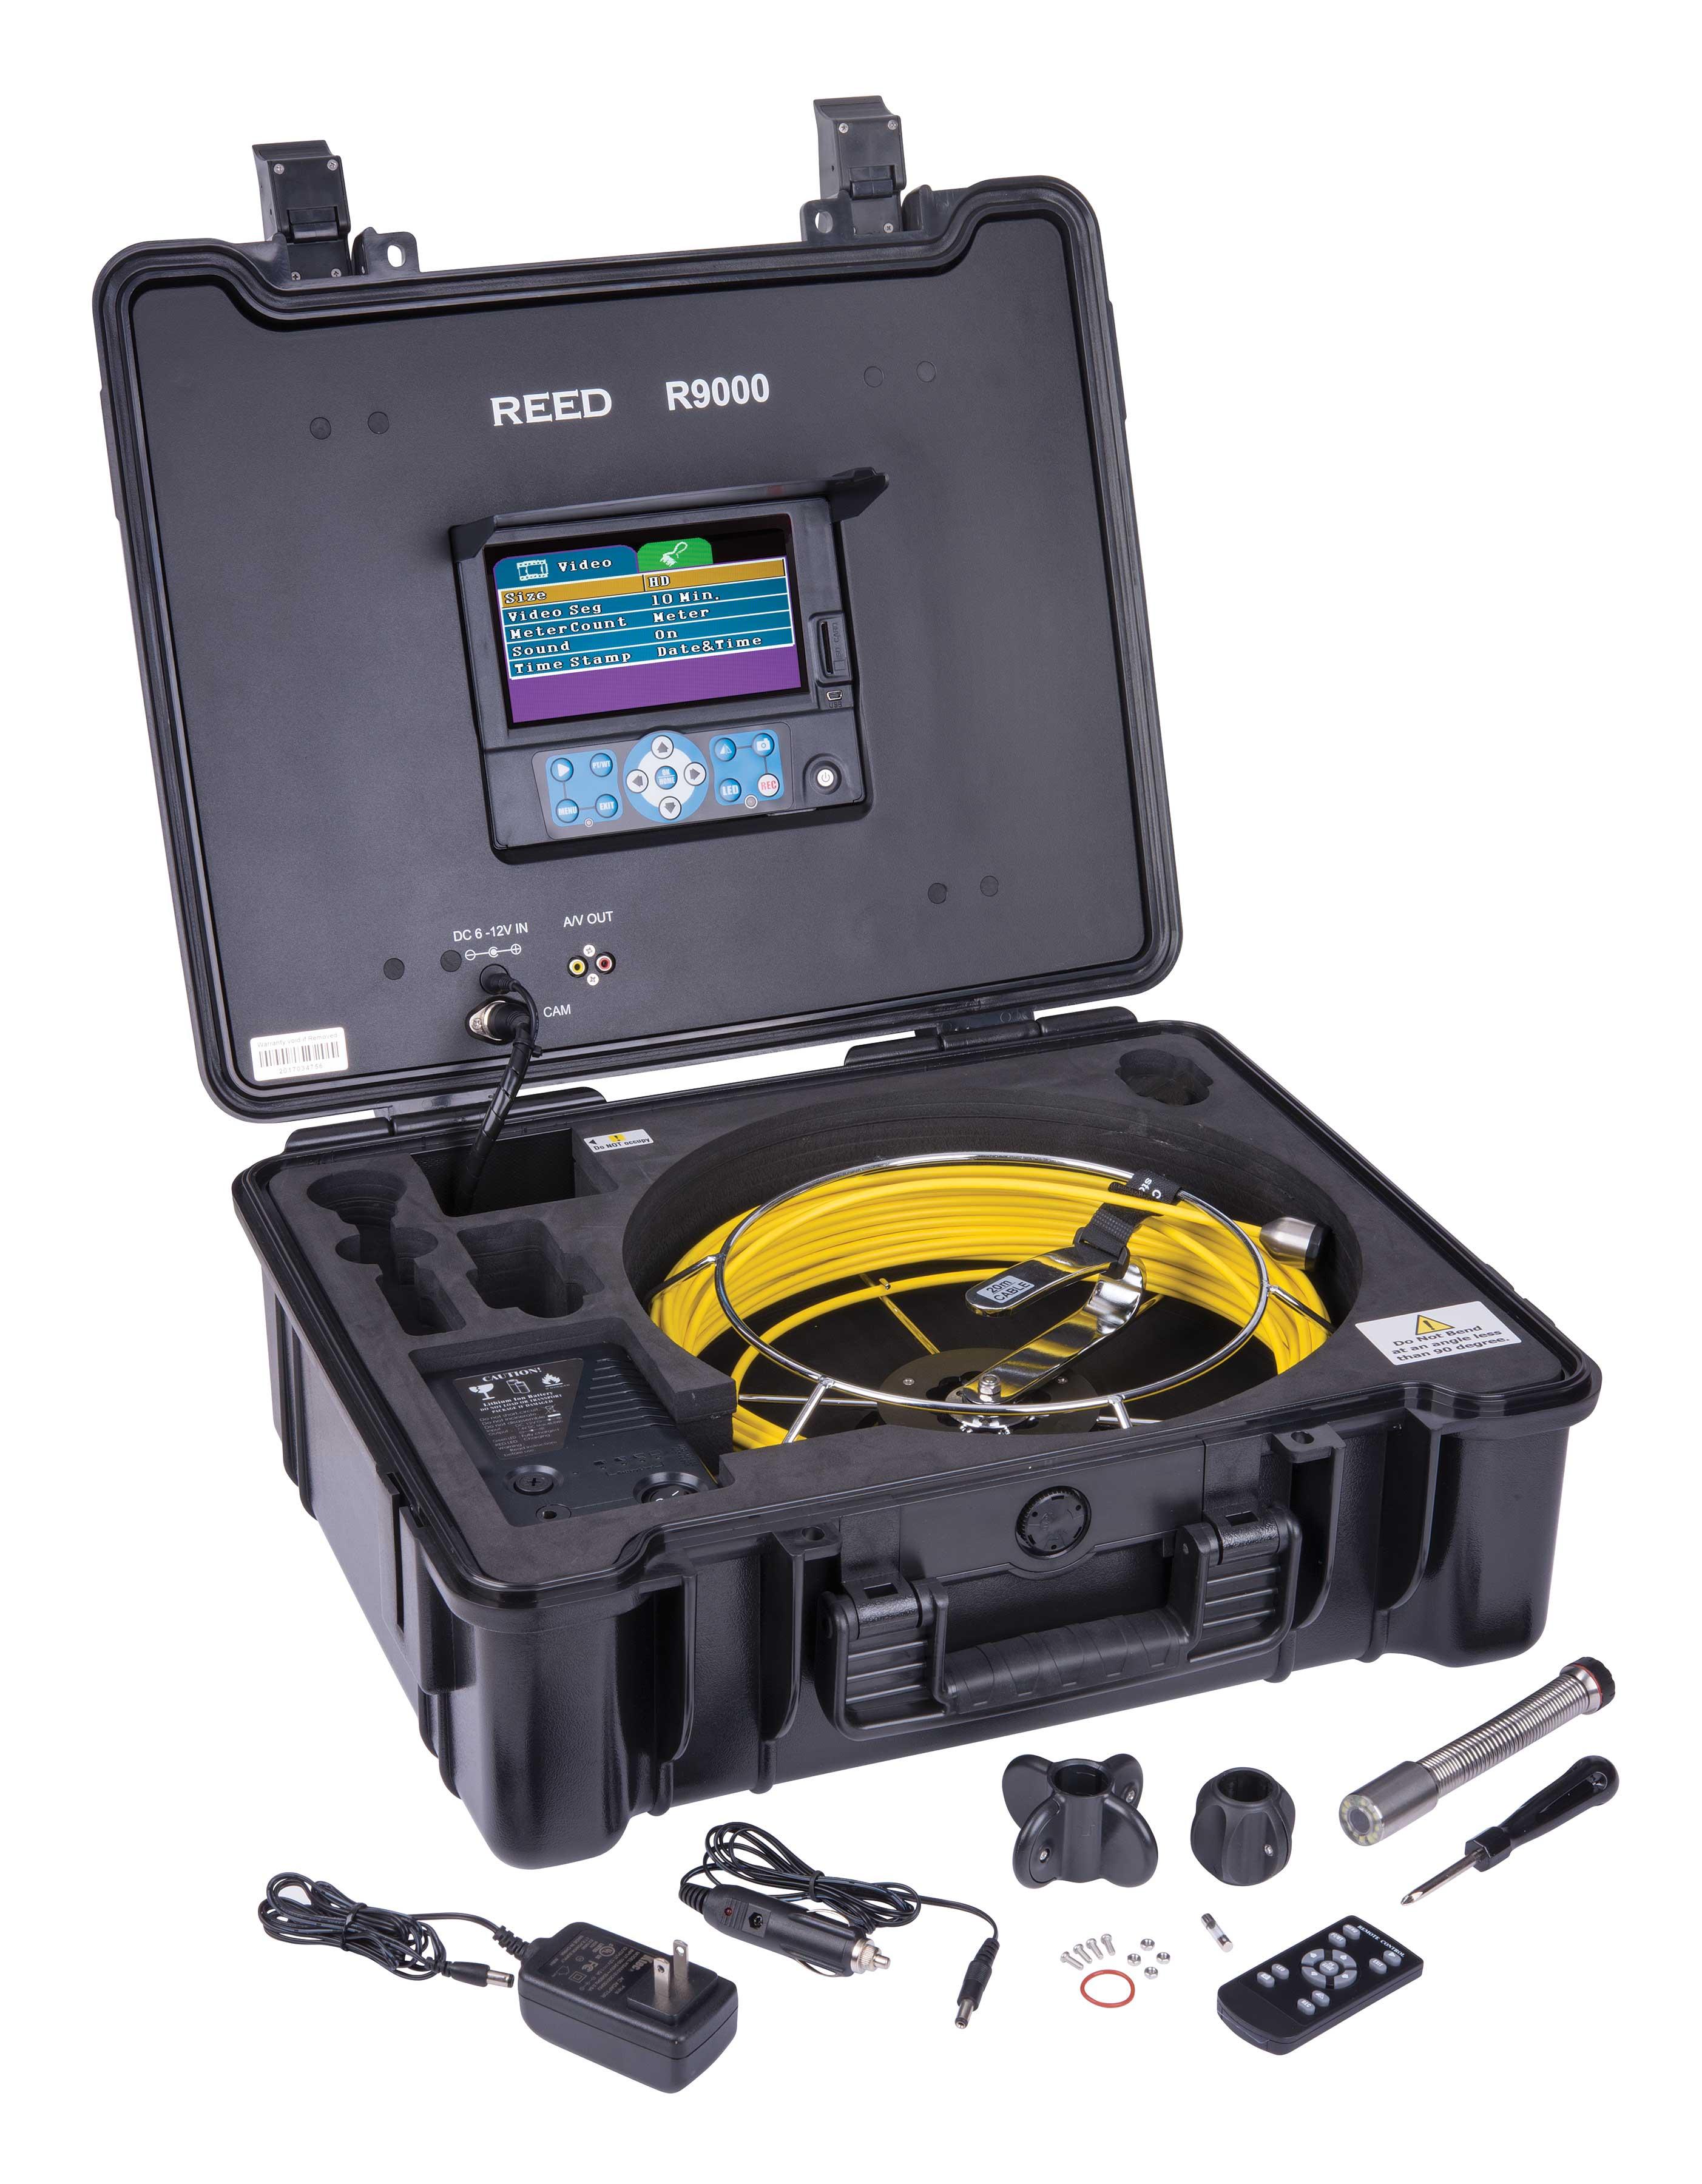 reed r9000 hd video inspection camera system. Black Bedroom Furniture Sets. Home Design Ideas